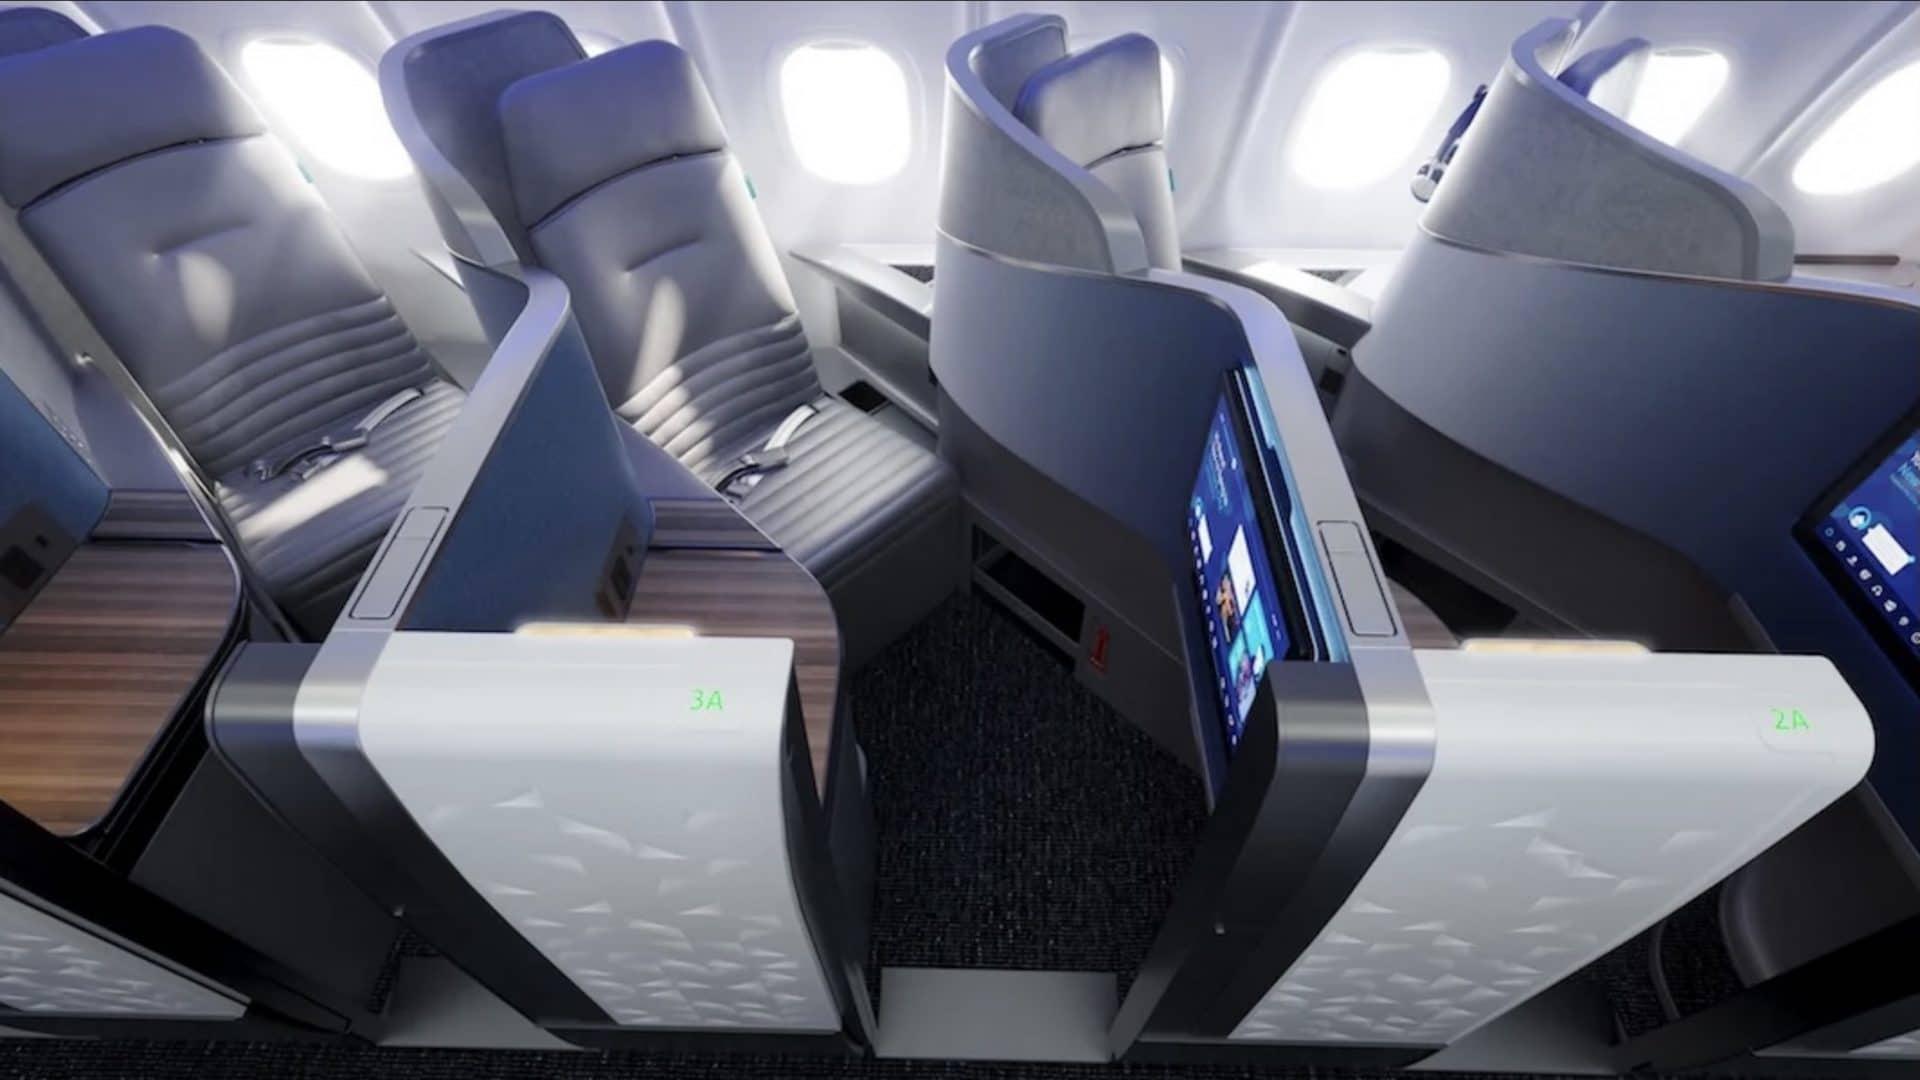 JetBlue Mint Business Class Airbus A321LR